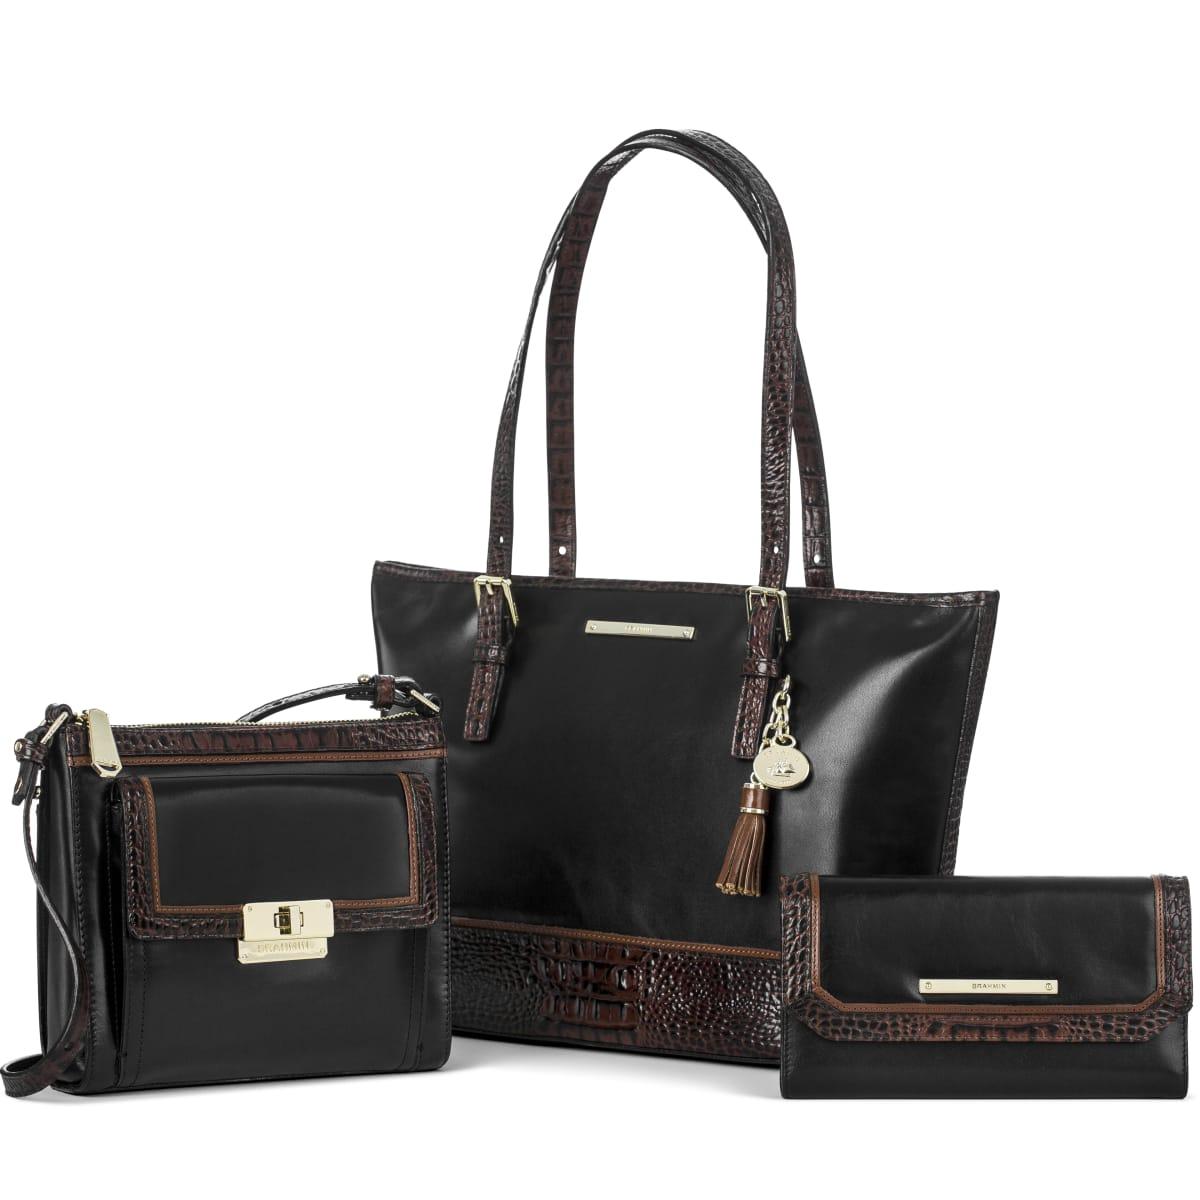 Brahmin Tri-texture handbag at Dillard's